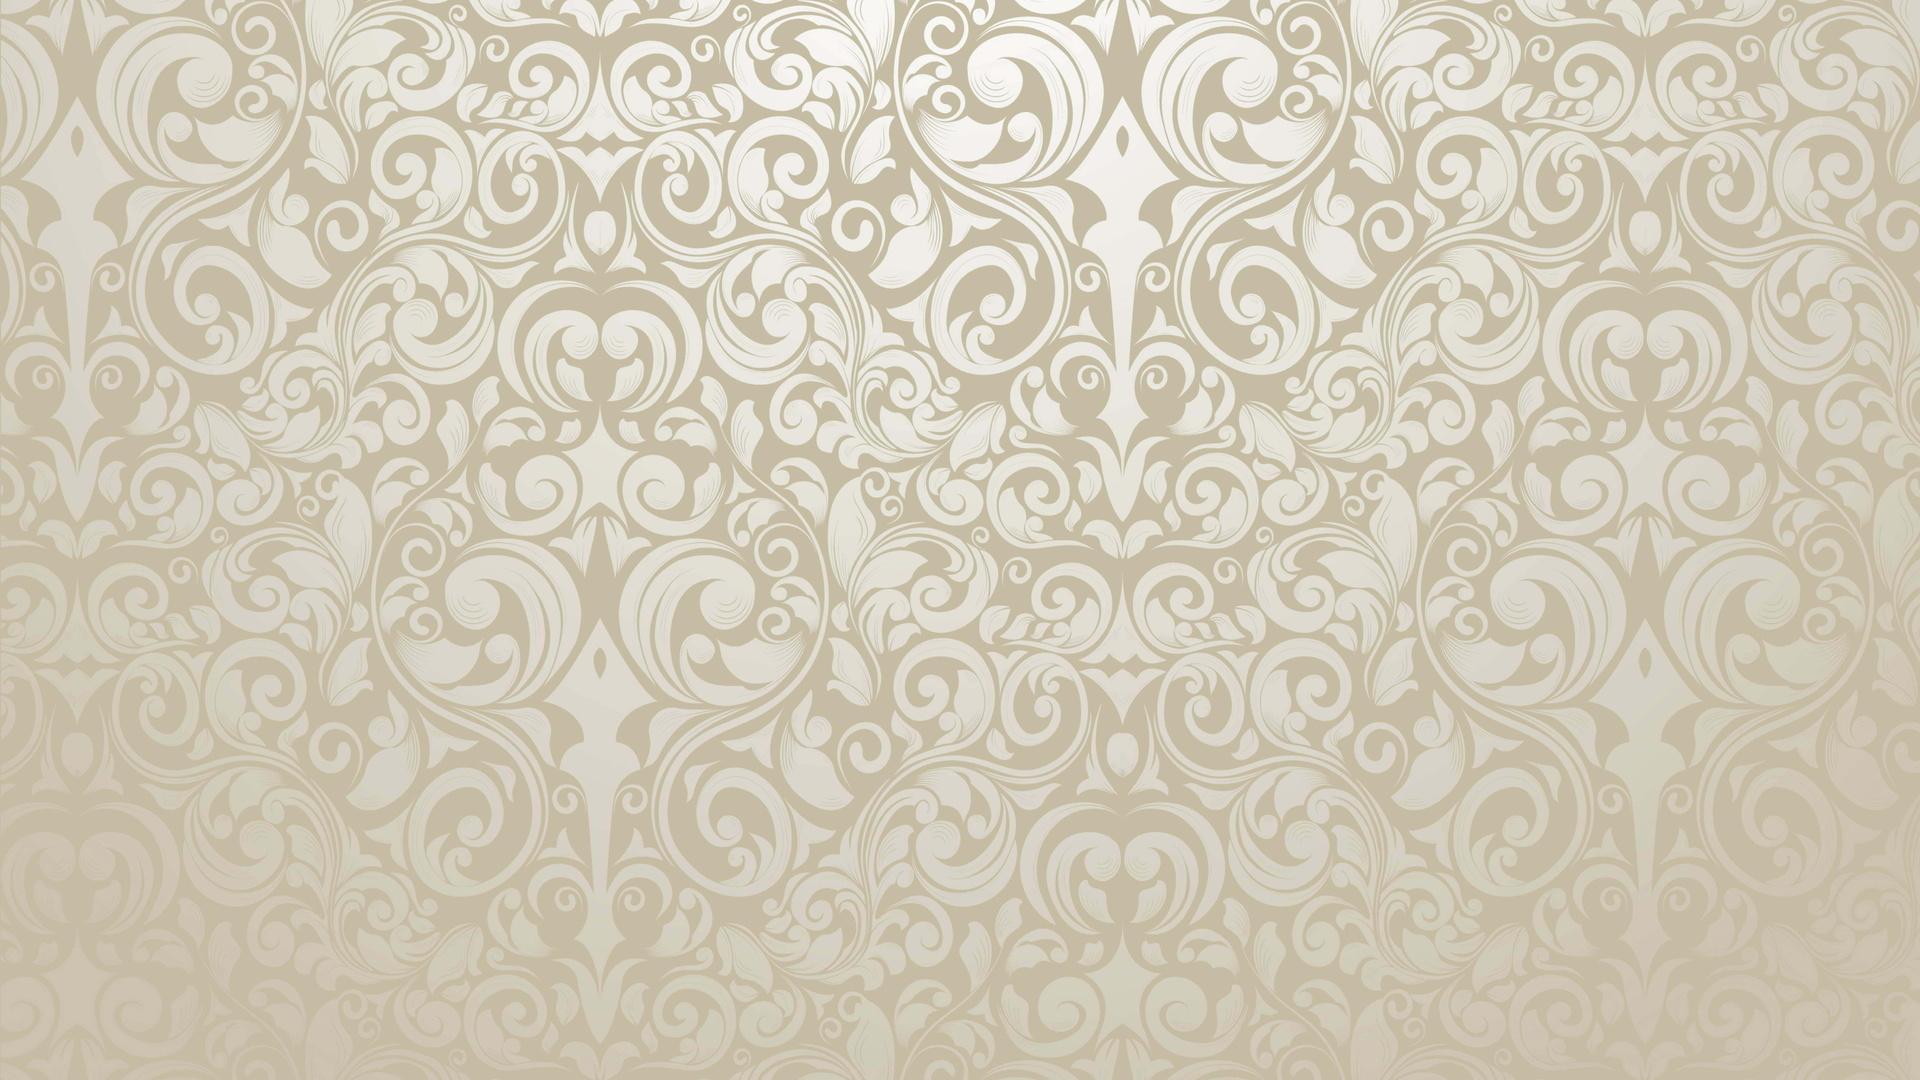 download-texture-beautifuls-for-desktop-li-orlmowtu-wallpaper-wp3605168